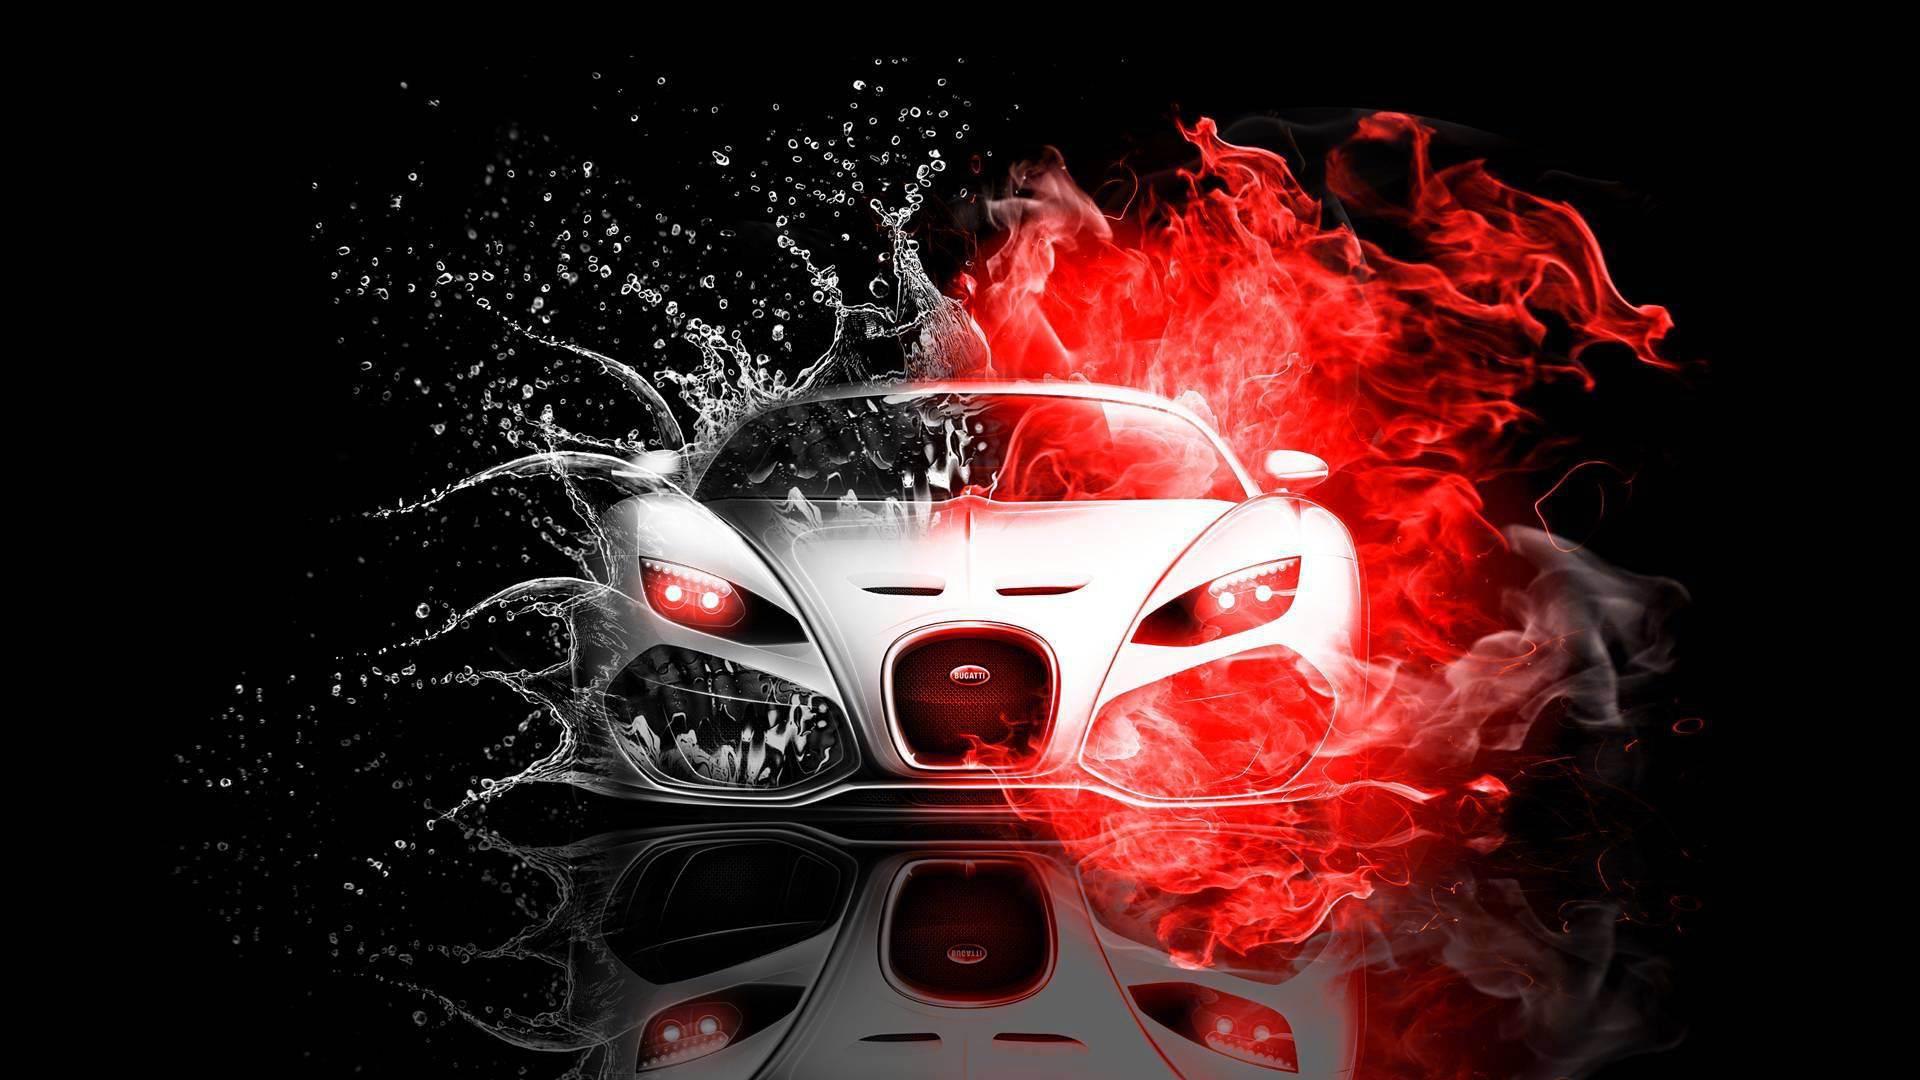 Furious 7 Car Lykan Hypersport HD Wallpaper   Stylish HD Wallpapers 1920x1080